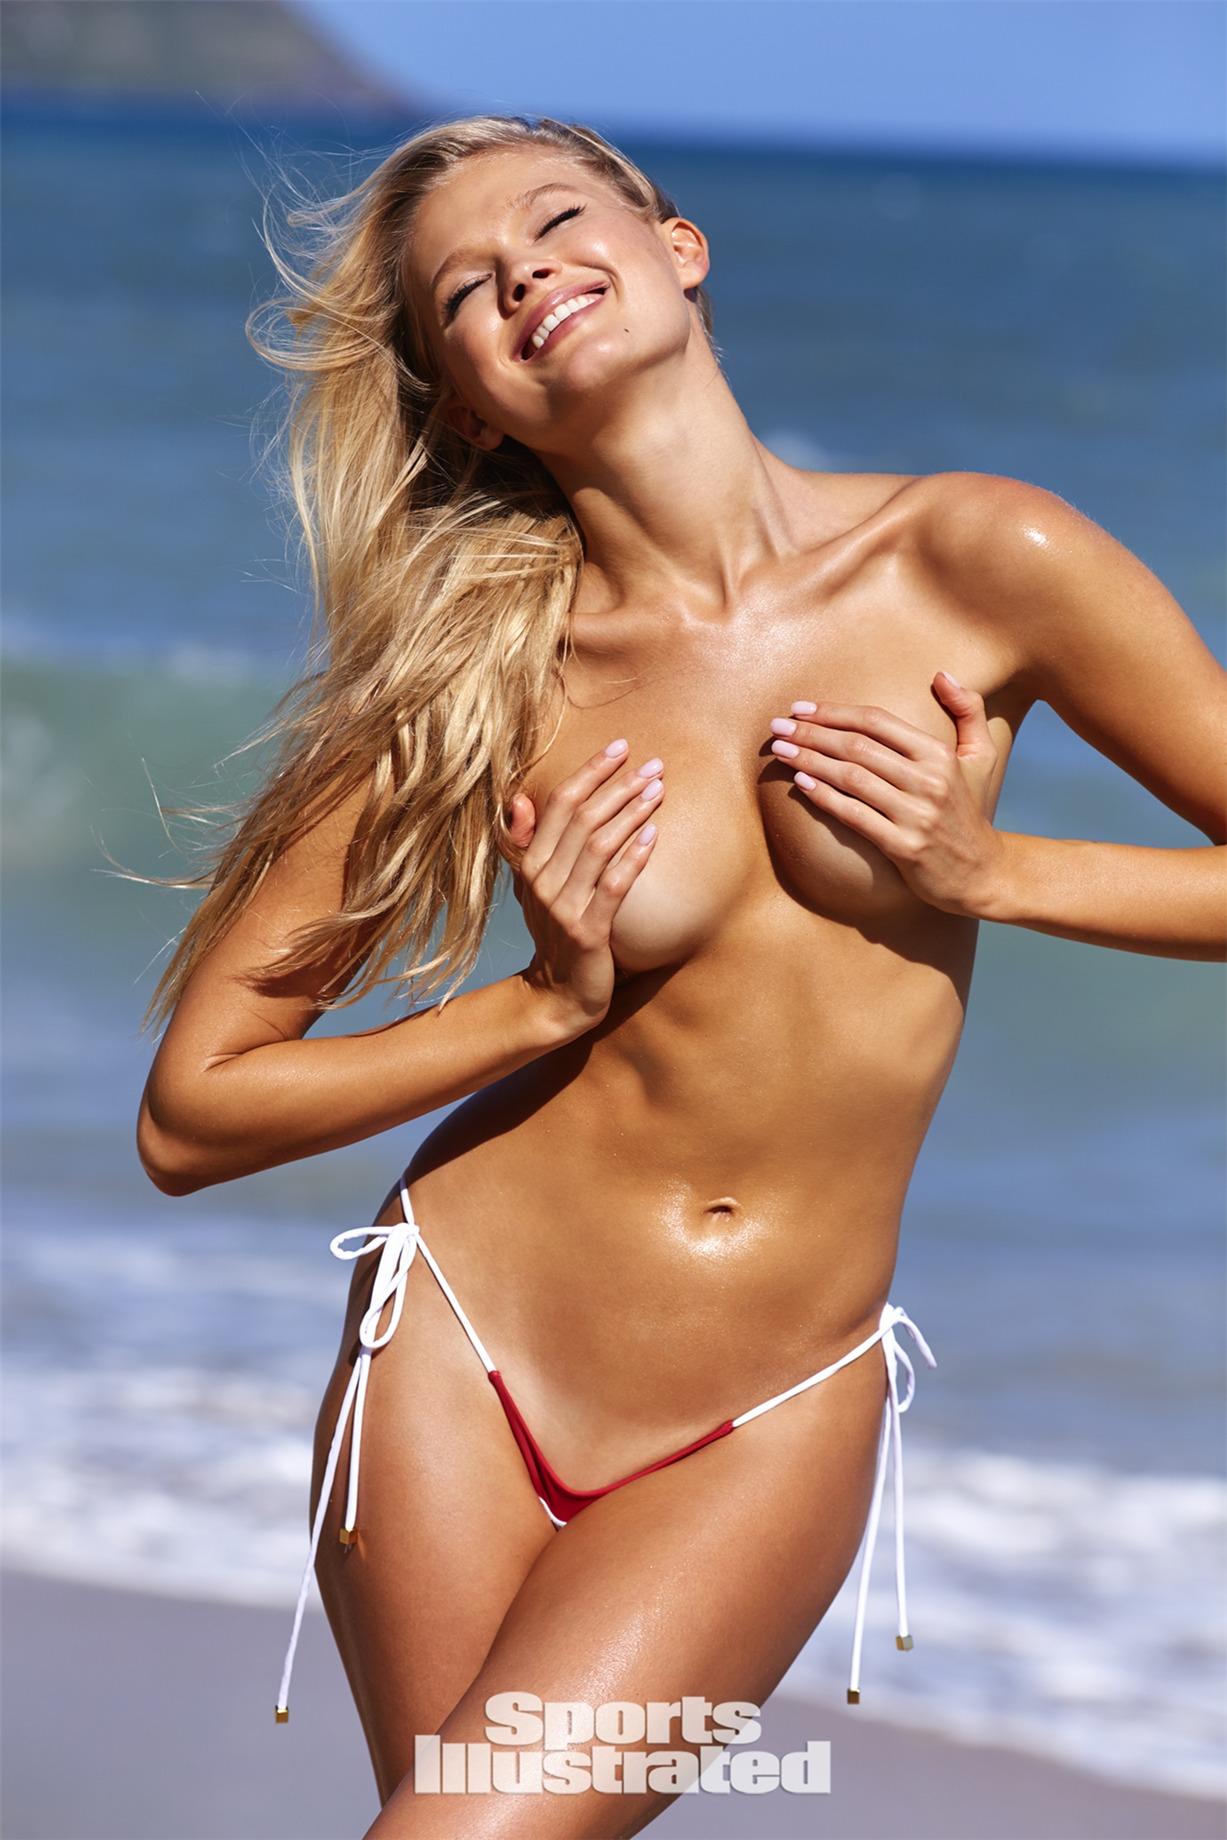 Vita Sidorkina / Вита Сидоркина в купальниках из новой коллекции Sports Illustrated Swimsuit 2018 issue / in Nevis by Josie Clough